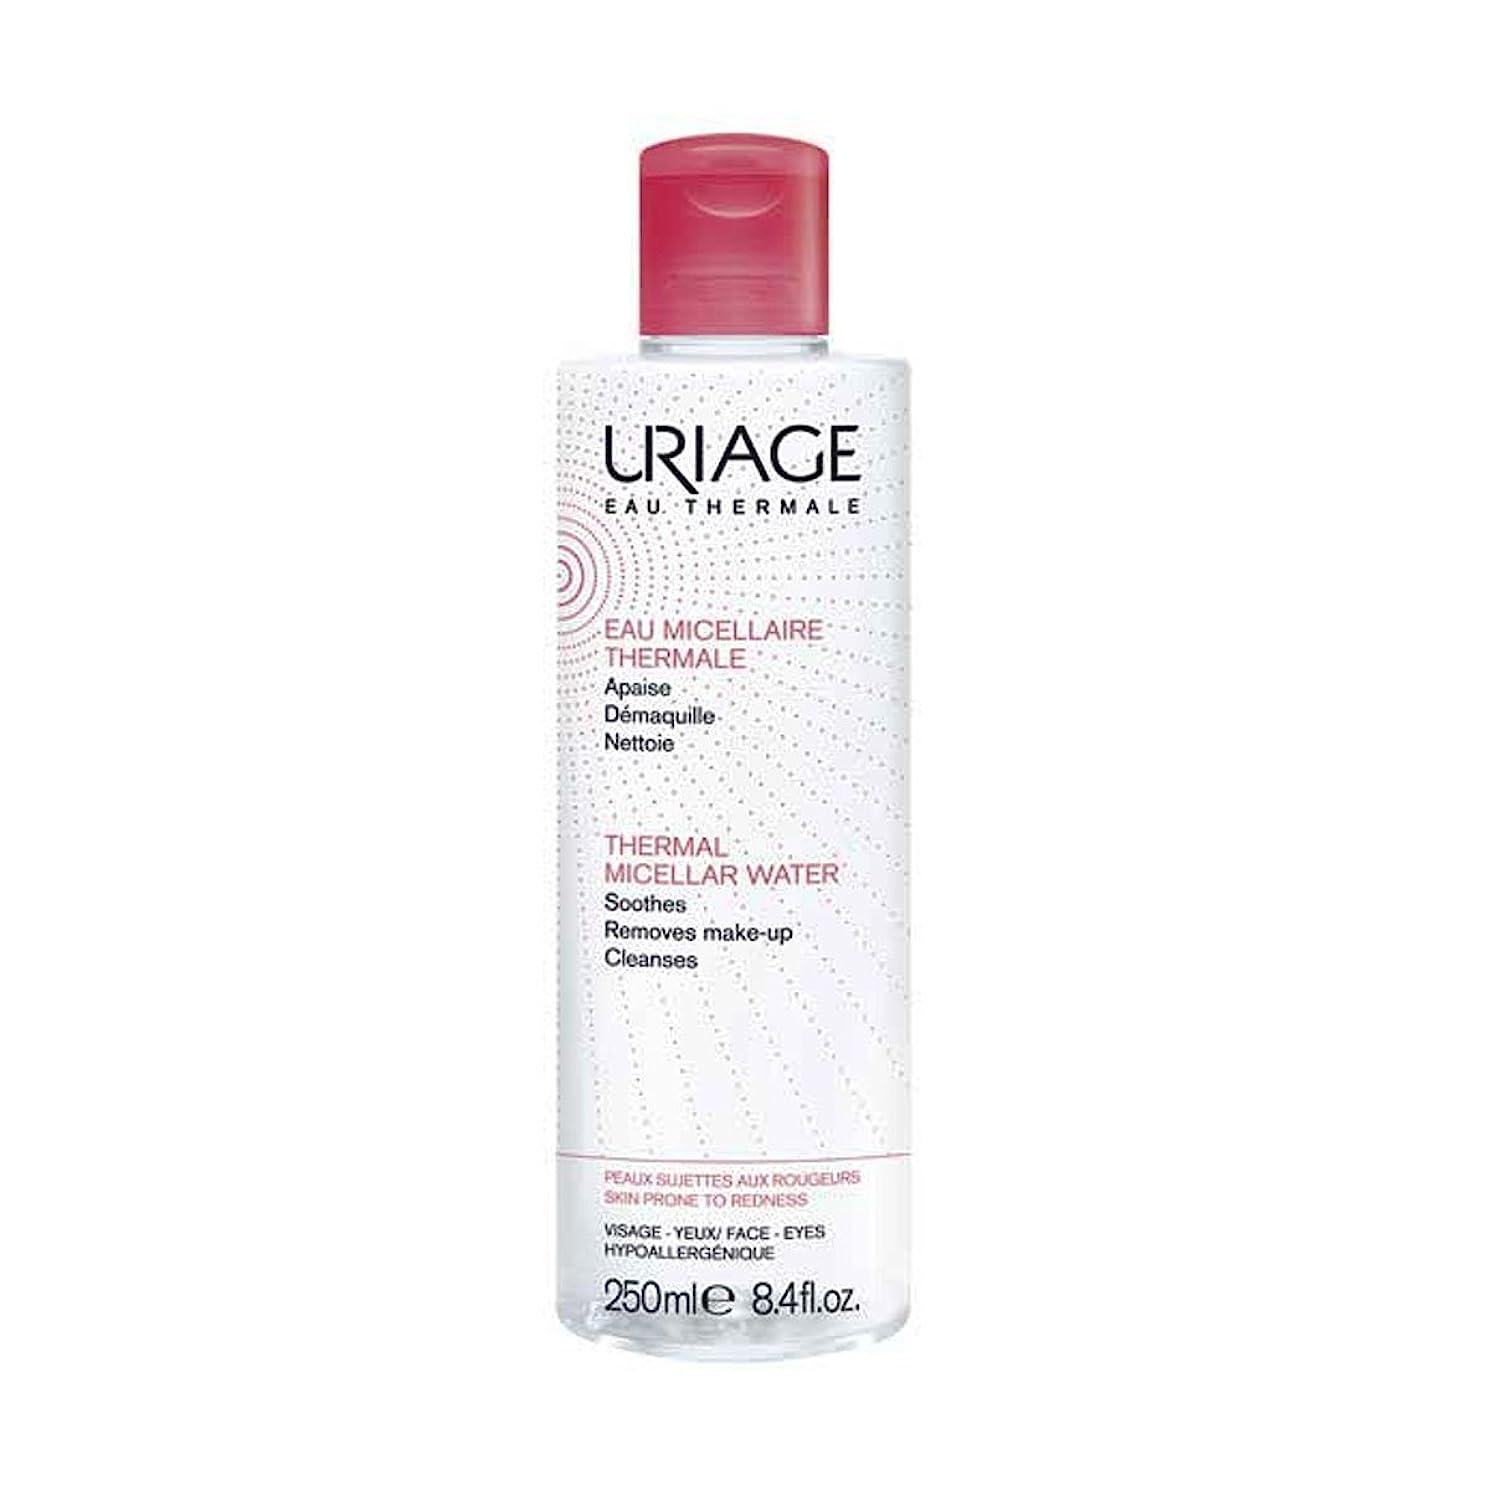 自発的小康犯人Uriage Thermal Micellar Water Skin Prone To Redness 250ml [並行輸入品]